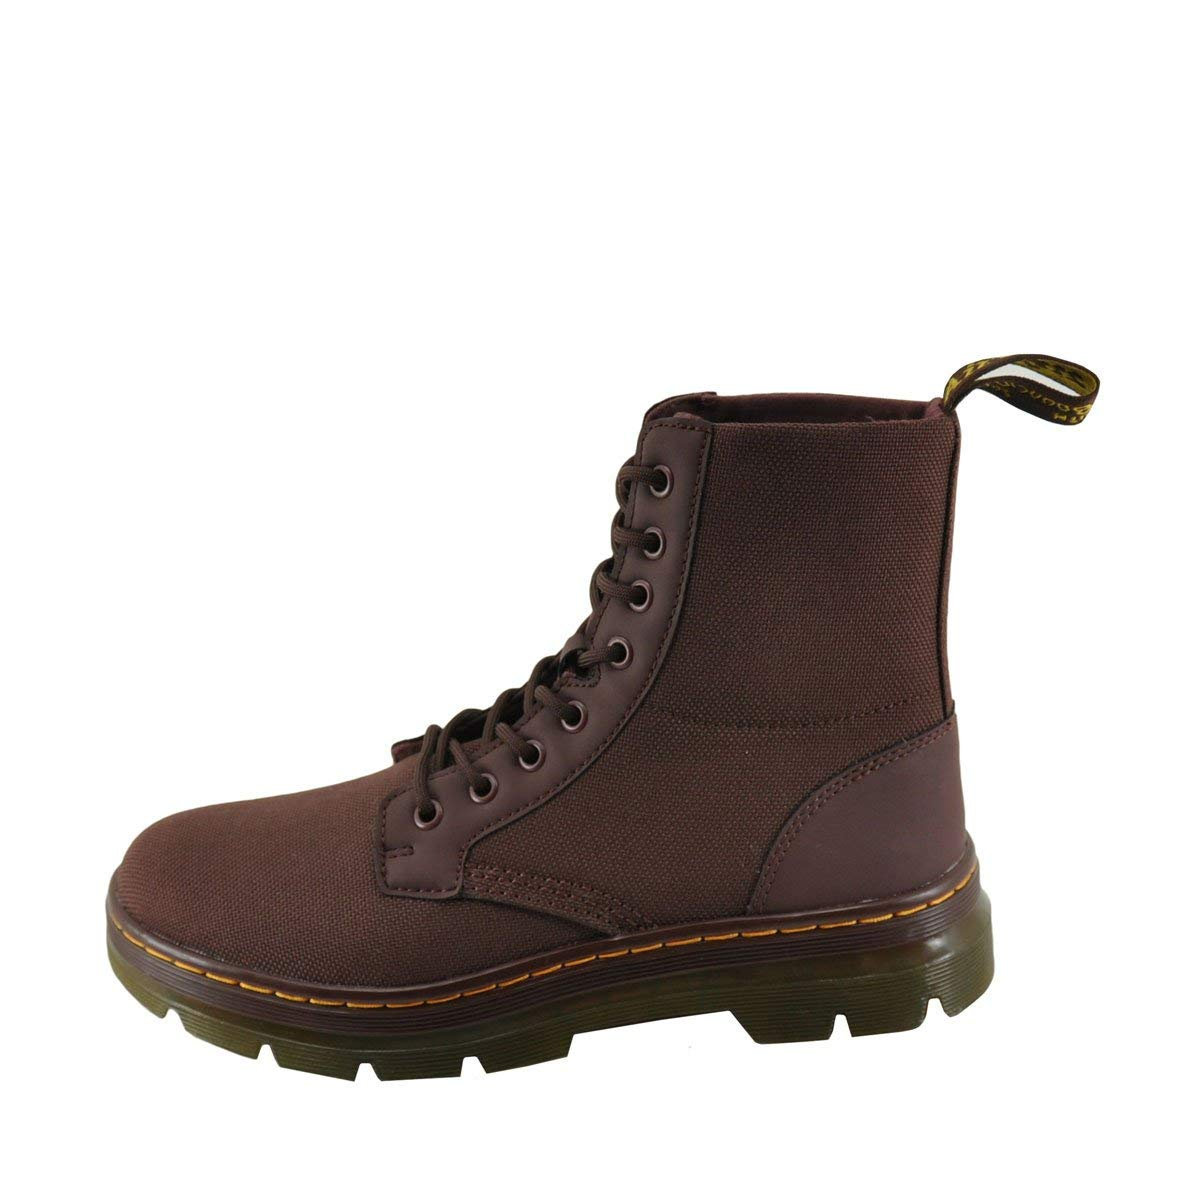 eebe6eeba4 Get Quotations · Dr. Martens Combs 8 Eye Nylon Boots 16607604